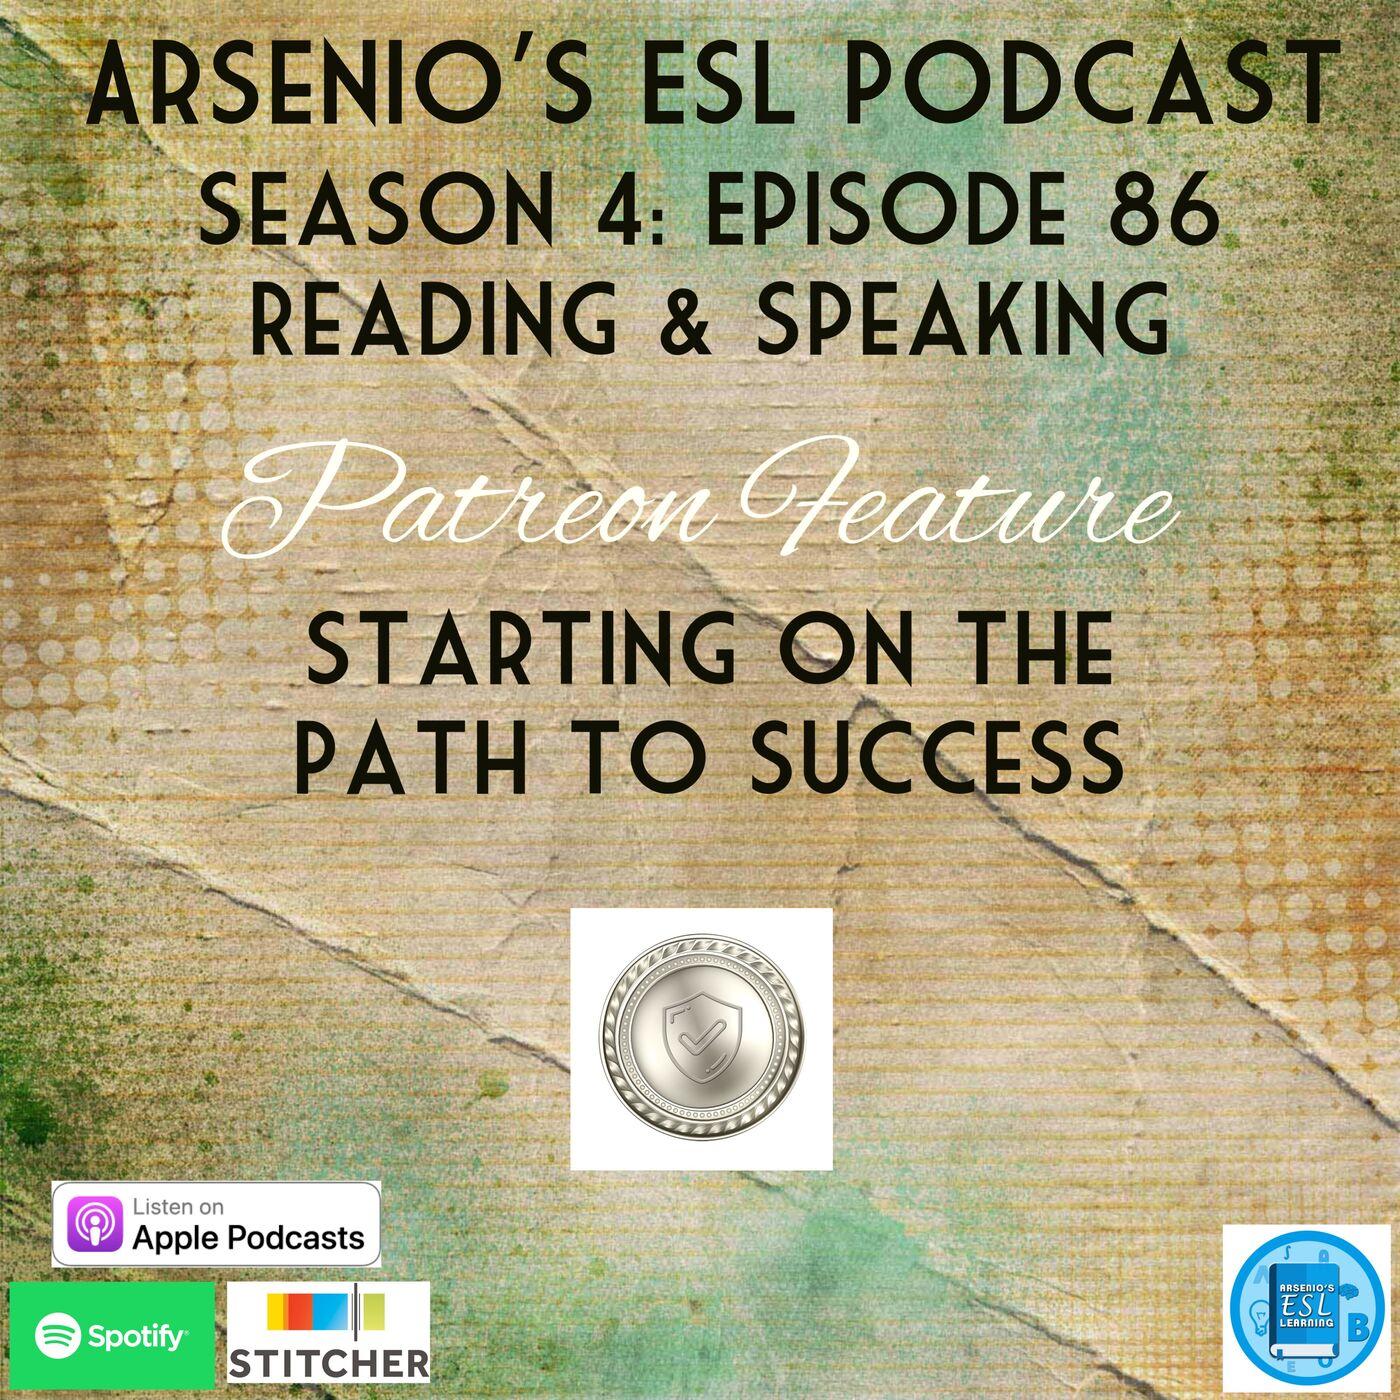 Arsenio's ESL Podcast: Season 4 - Episode 86 - Reading & Speaking - Starting on The Path to Success